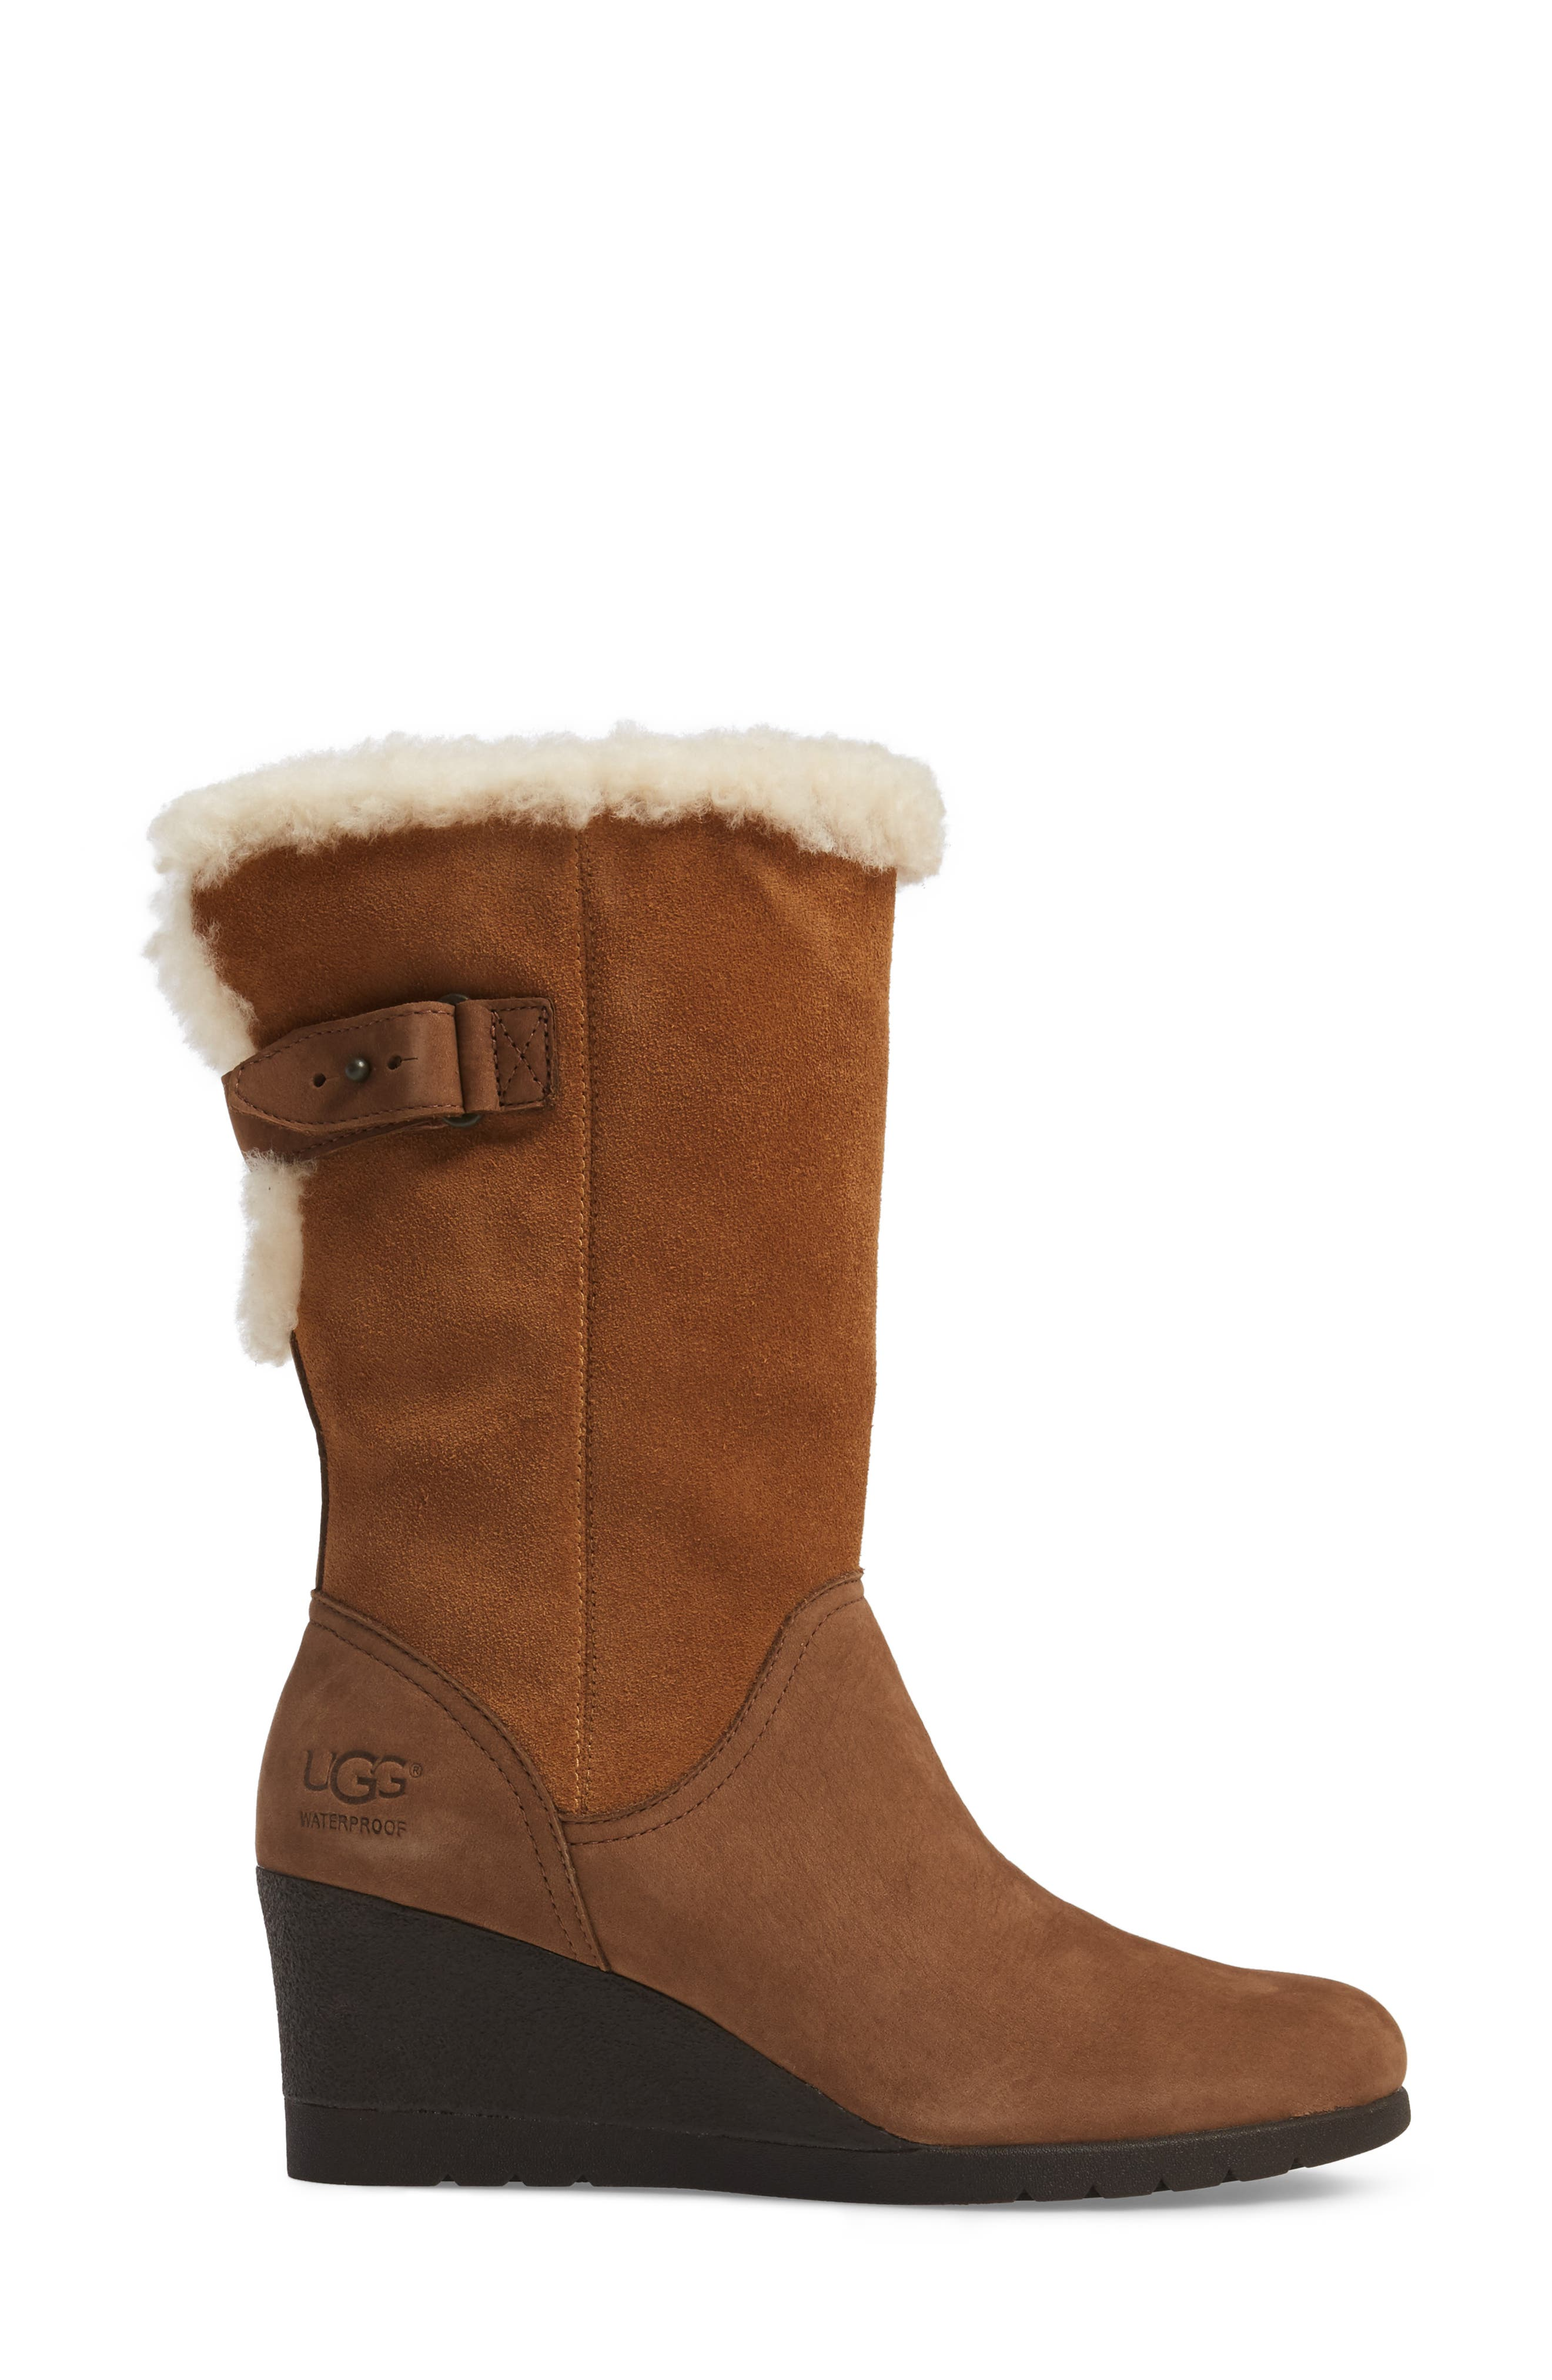 Alternate Image 3  - UGG® Edelina Waterproof Wedge Boot (Women)